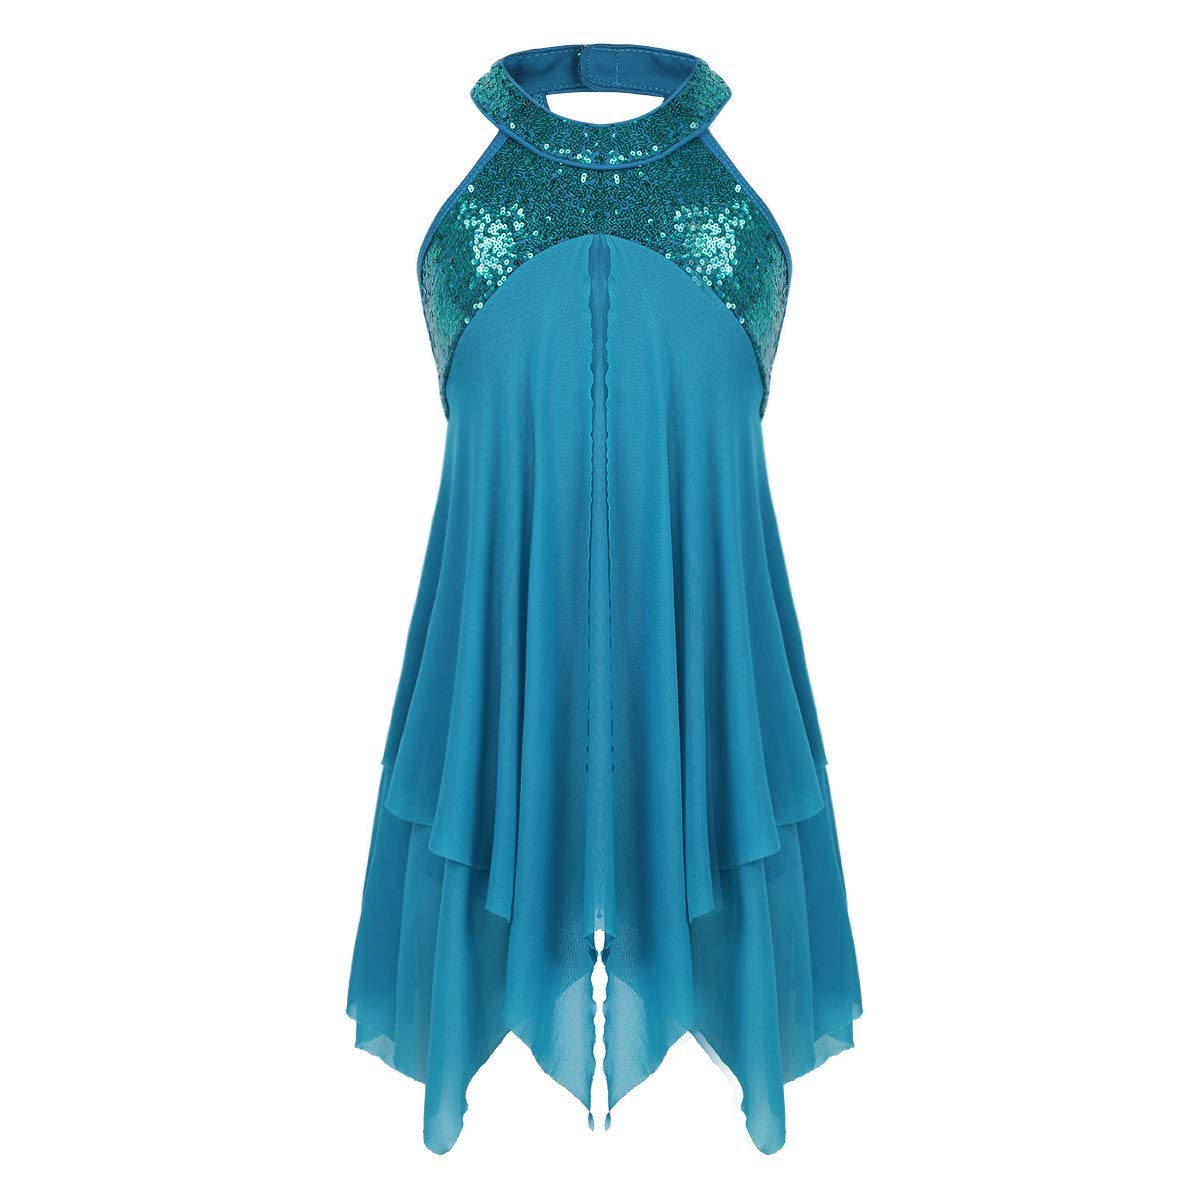 iixpin Mädchen Ballett Kleider Sling Tanzkleid mit Unregelmäßiger Rock Gymnastik Sport Training Trikot Kleid Gr.98-164